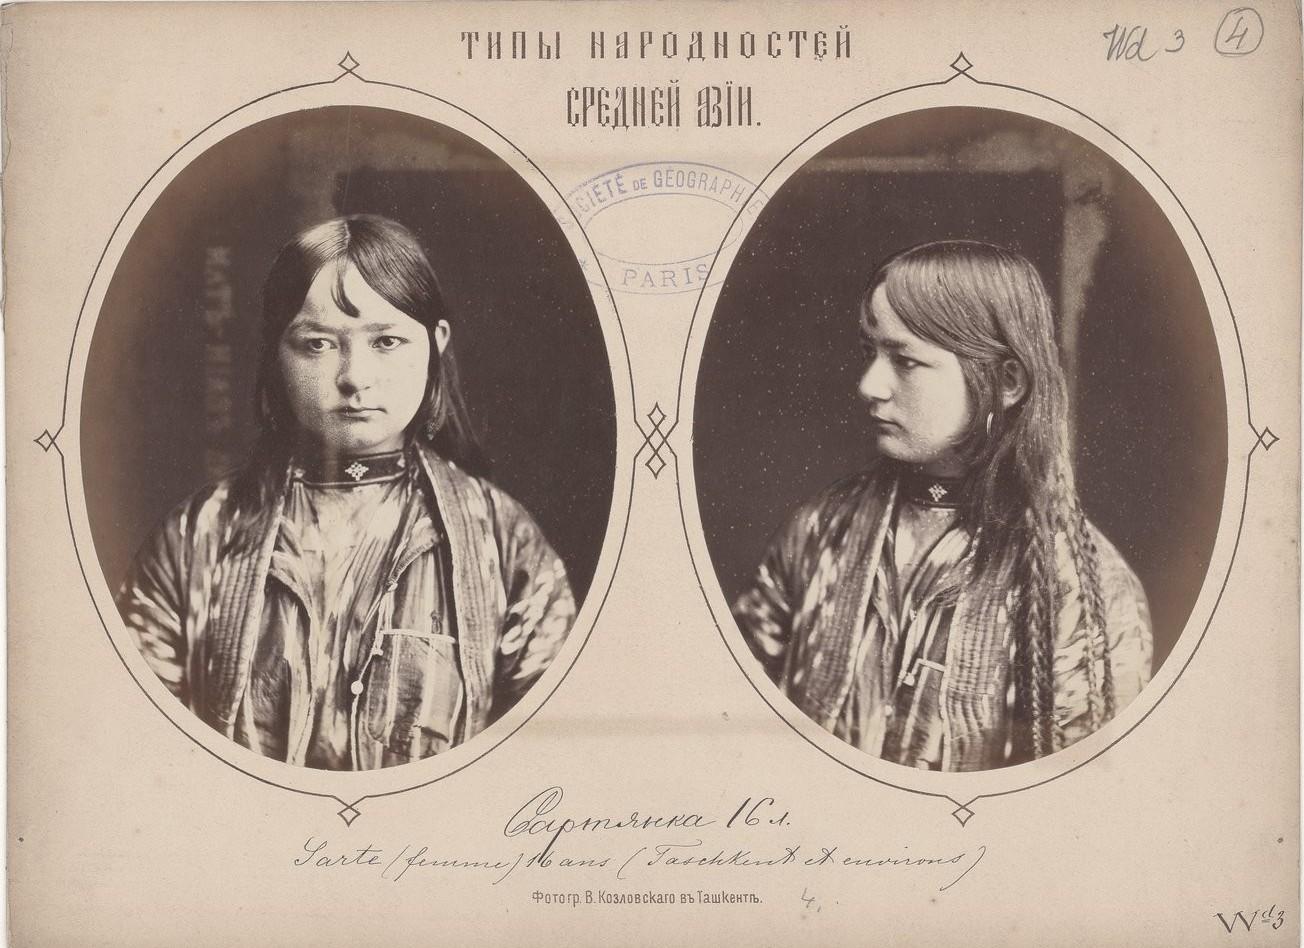 Сартянка, 16 лет. Ташкент и окрестности